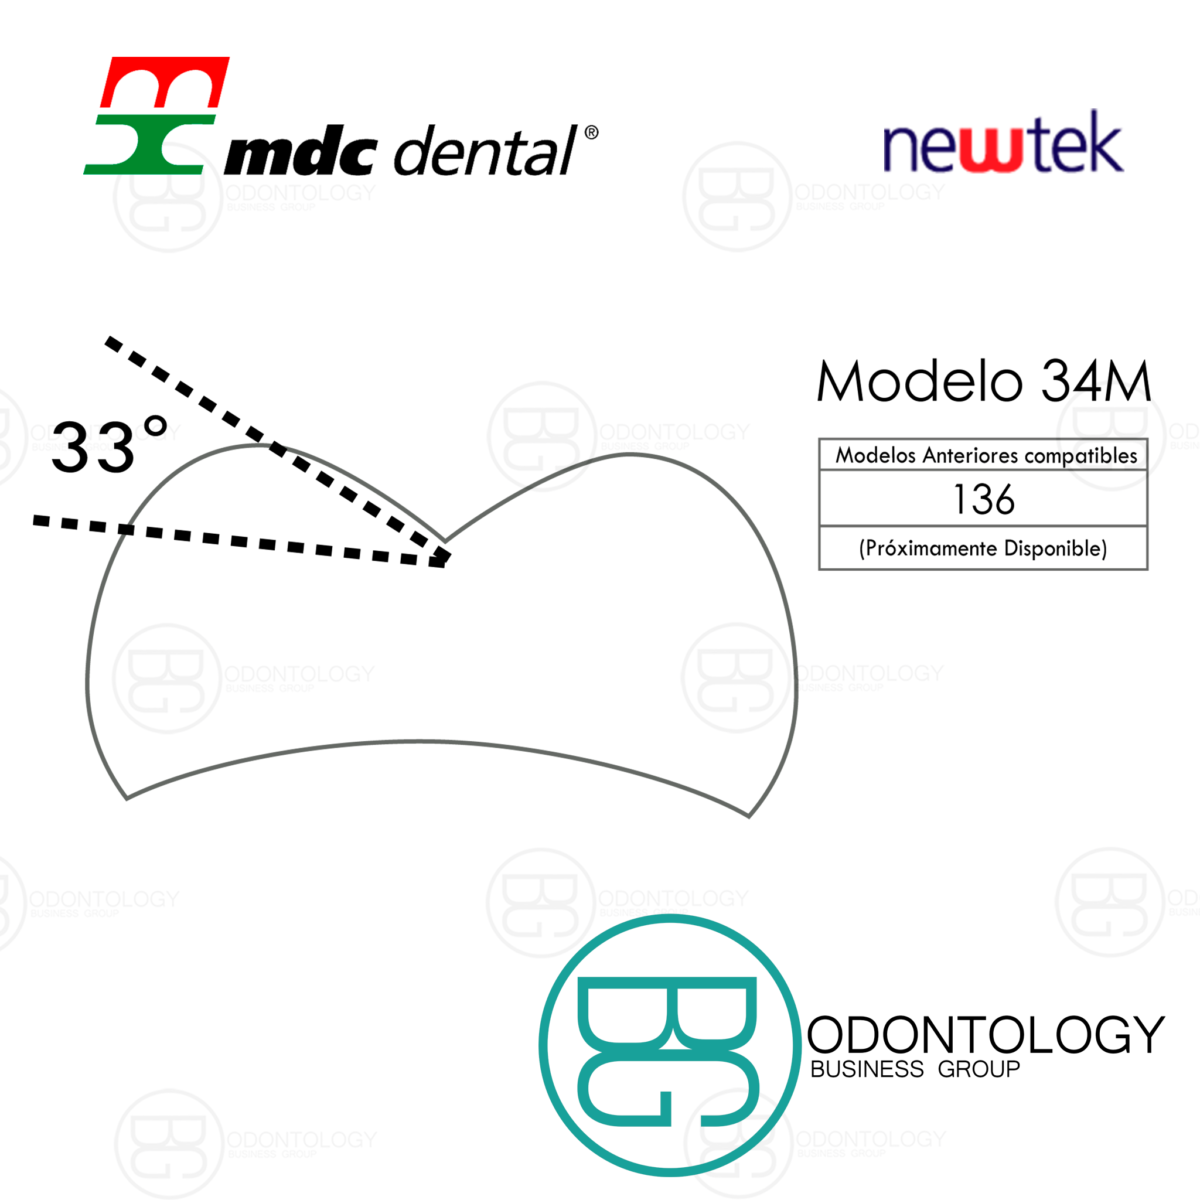 Dientes de Resina Posteriores - Superiores -Marca: new tek Consumibles de Laboratorio | Odontology BG